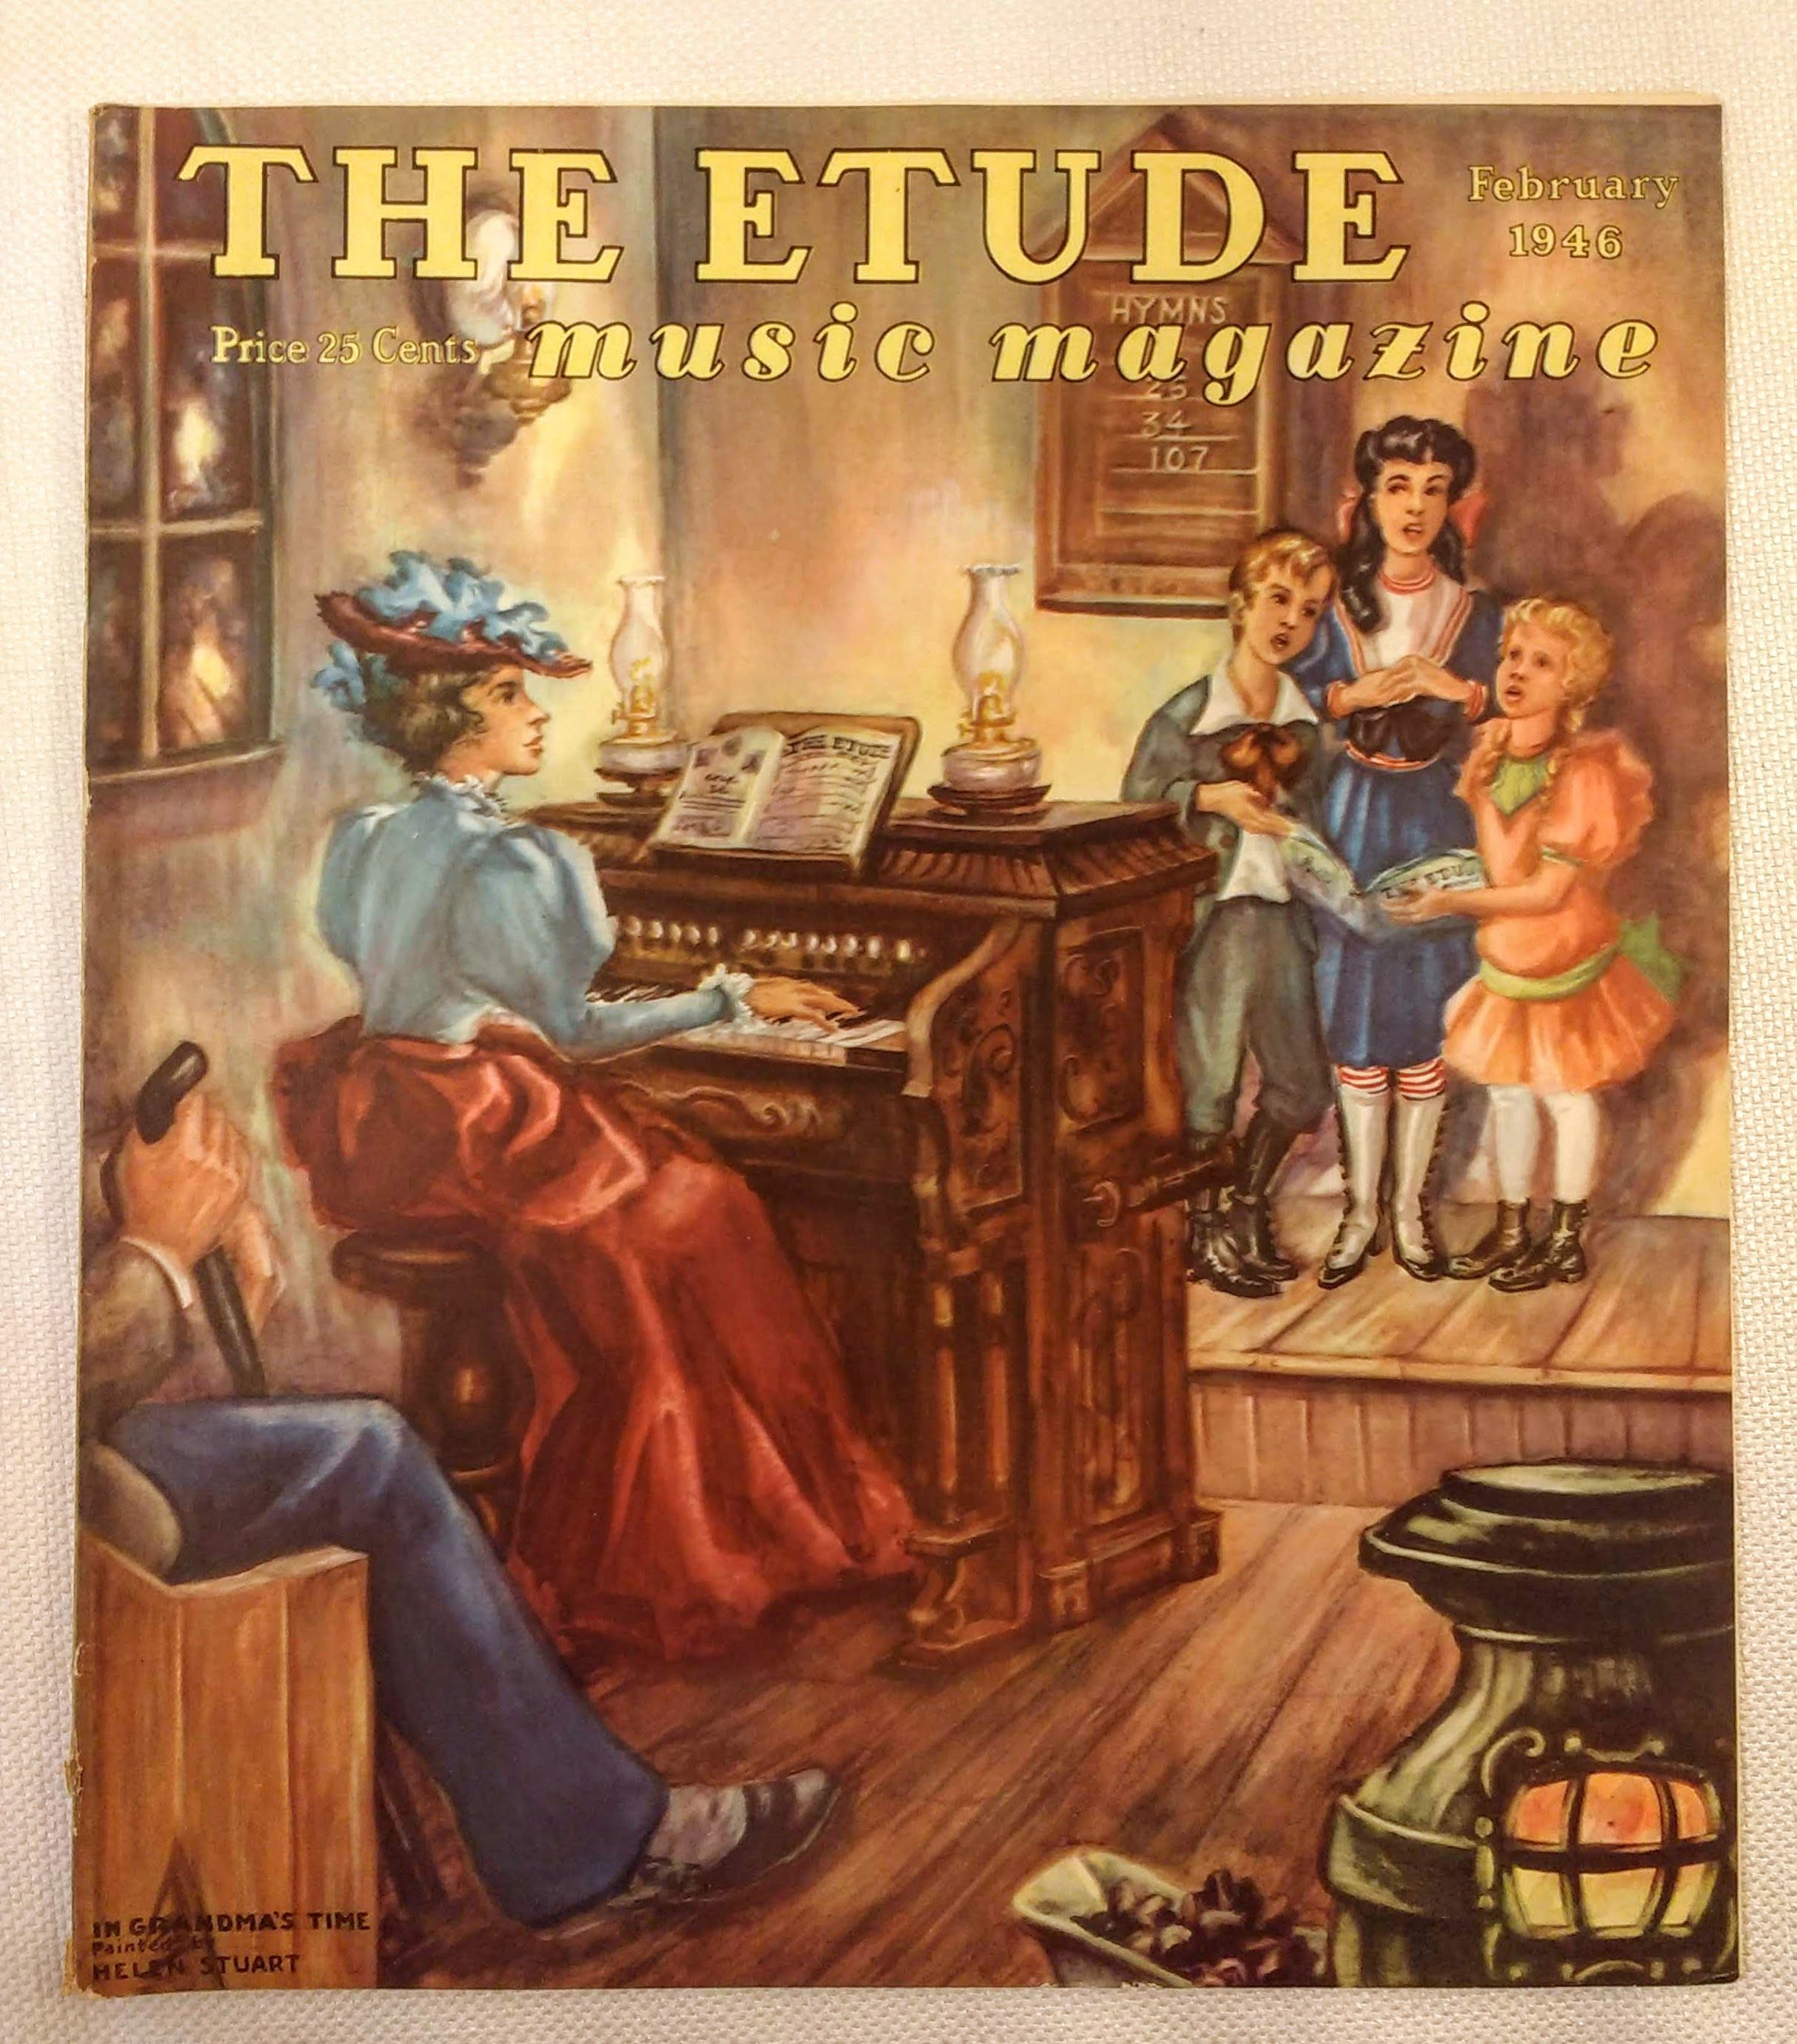 Image for The Etude Music Magazine: Volume LXIV, No. 2; February, 1946